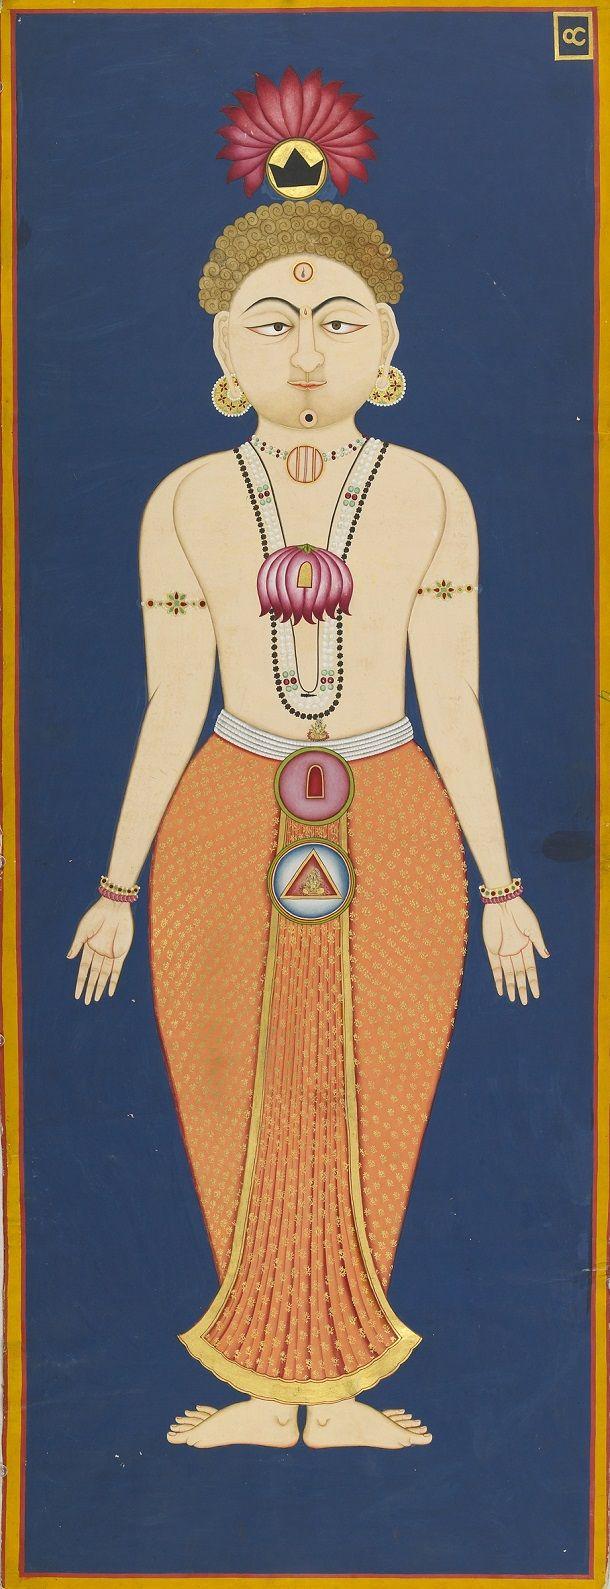 The Chakras of the Subtle Body - folio 4 from the Siddha Siddhanta Paddhati Bulaki - India, Rajasthan, Jodhpur 1824 (Samvat 1881) - Opaque watercolor and gold on paper